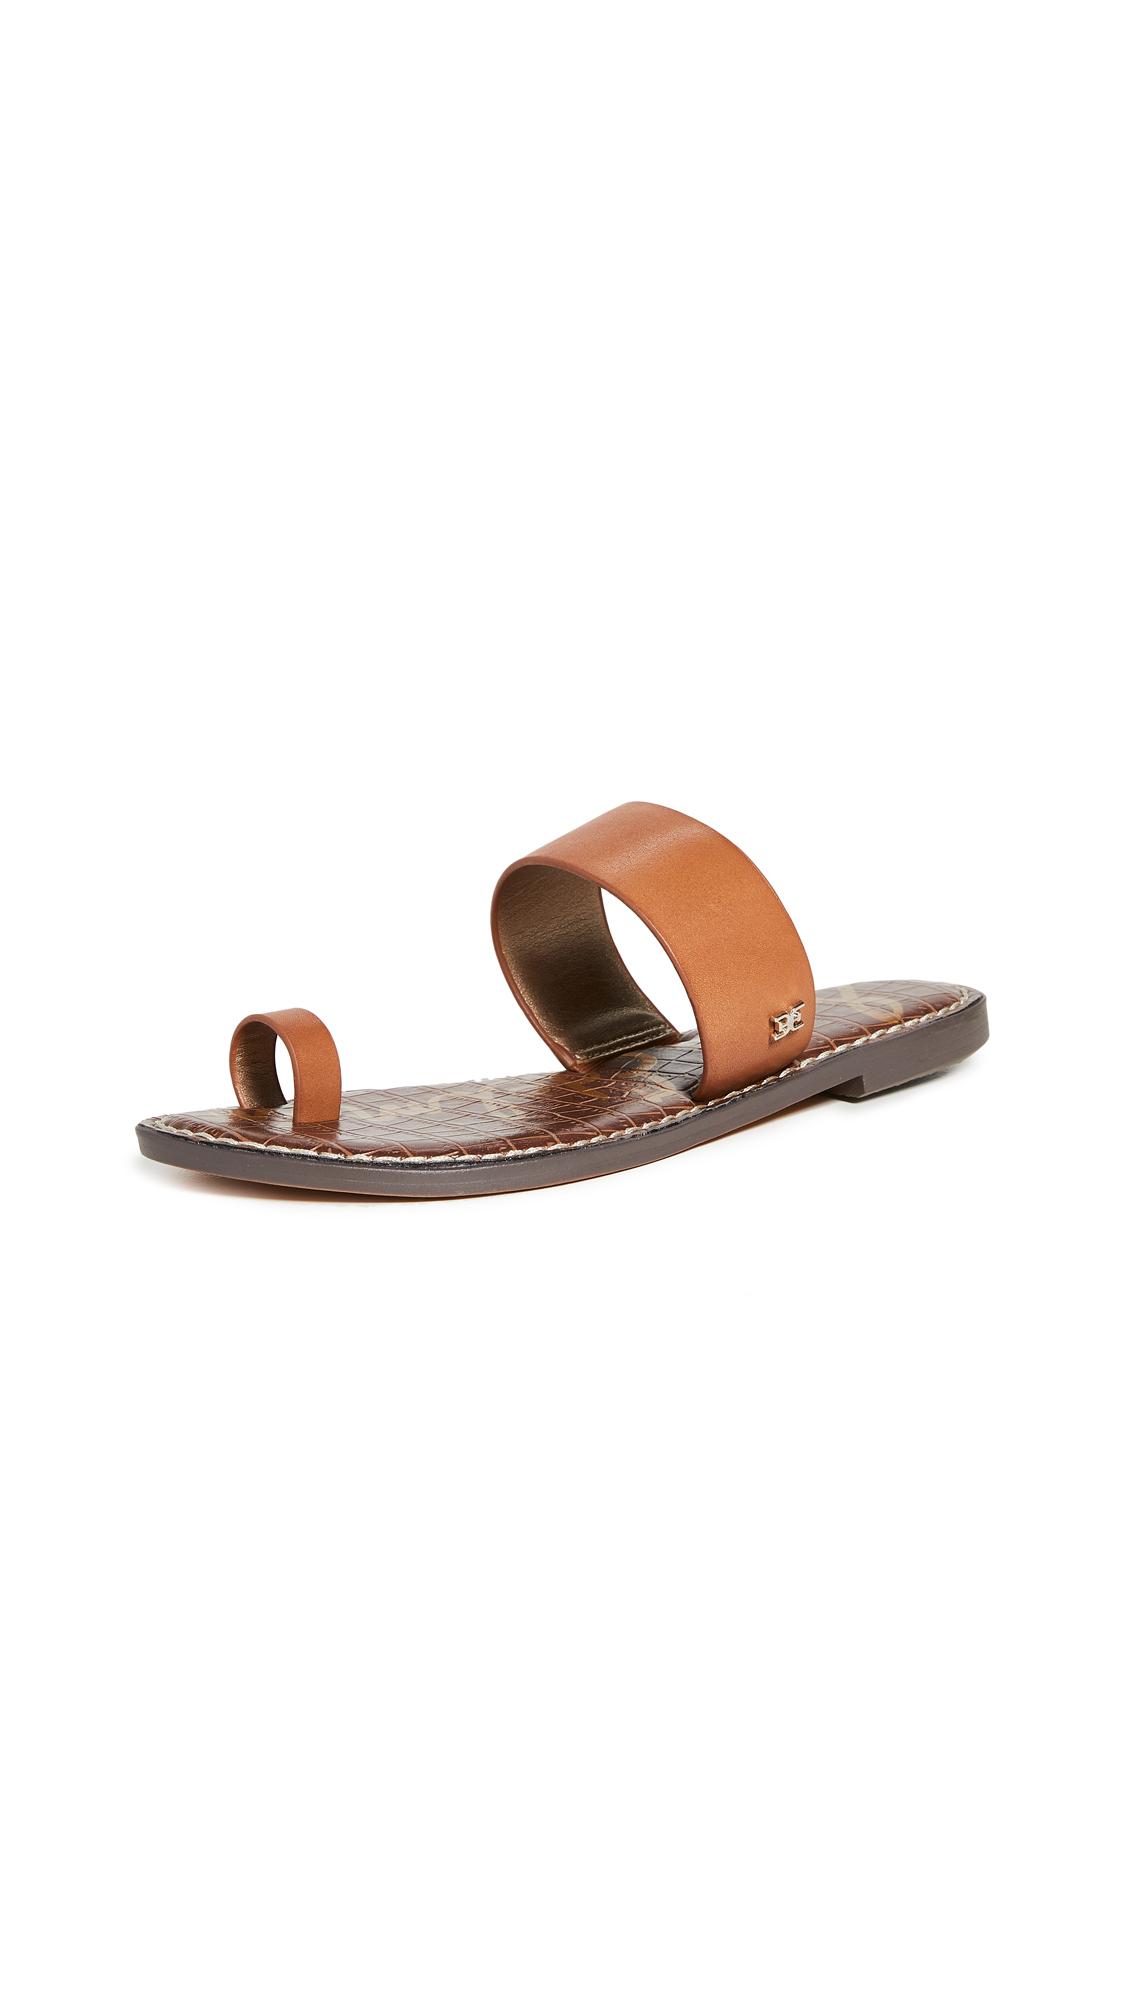 Buy Sam Edelman Gorgene Slides online, shop Sam Edelman